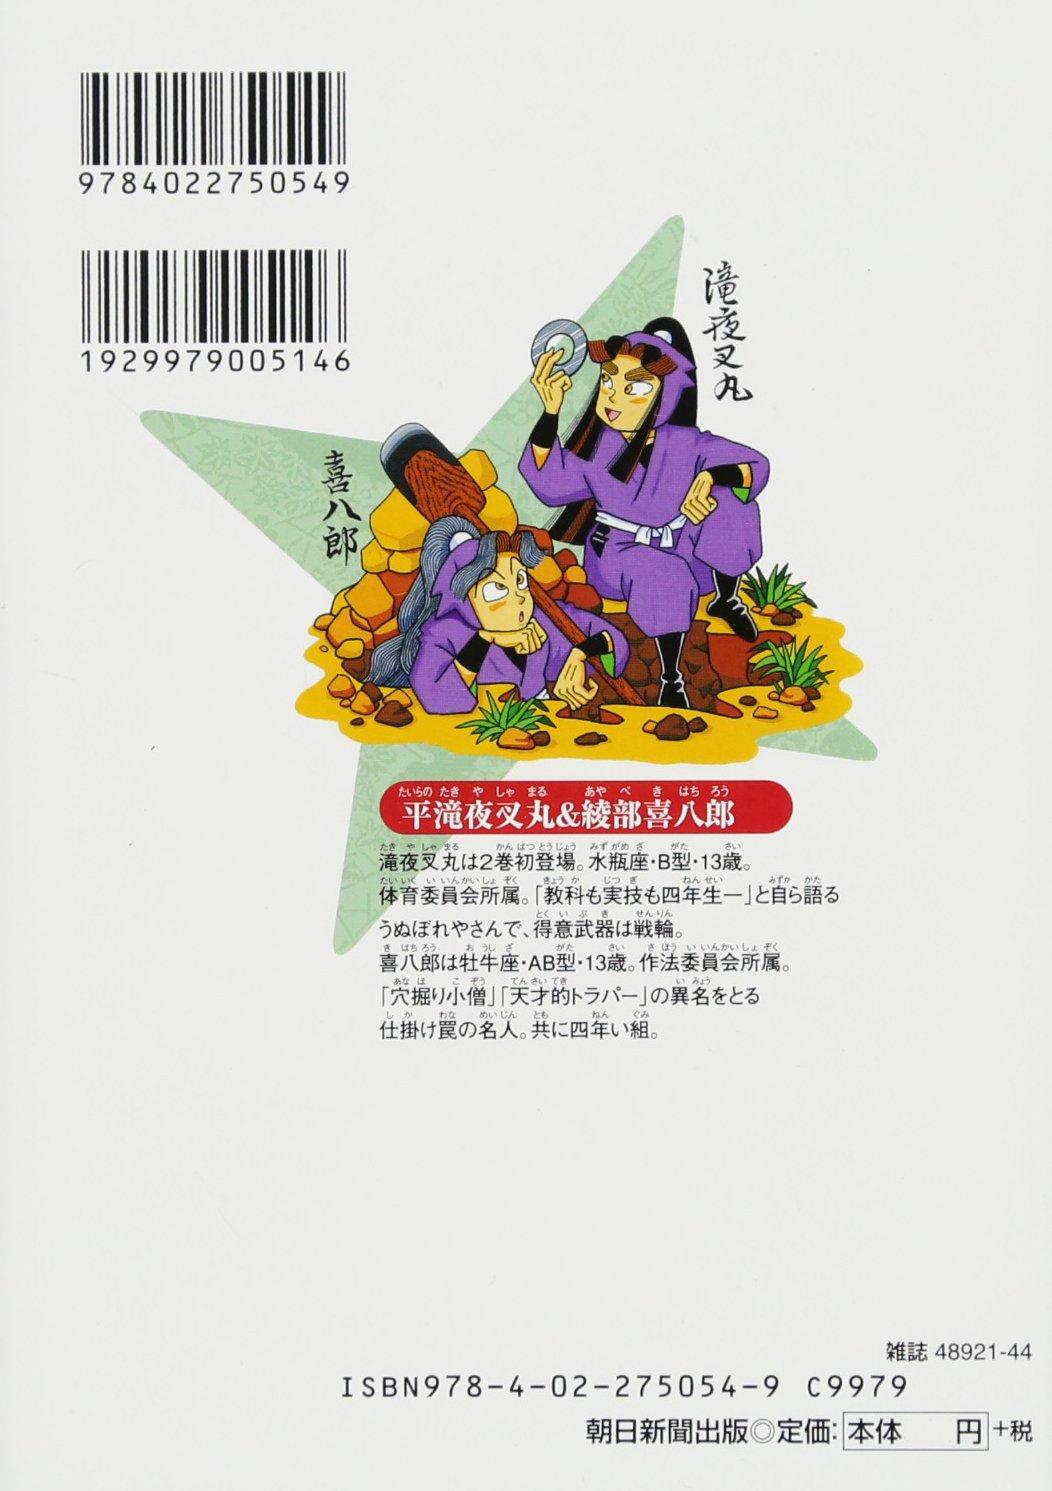 Rakudai Ninja Rantaro [54]: 9784022750549: Amazon.com: Books